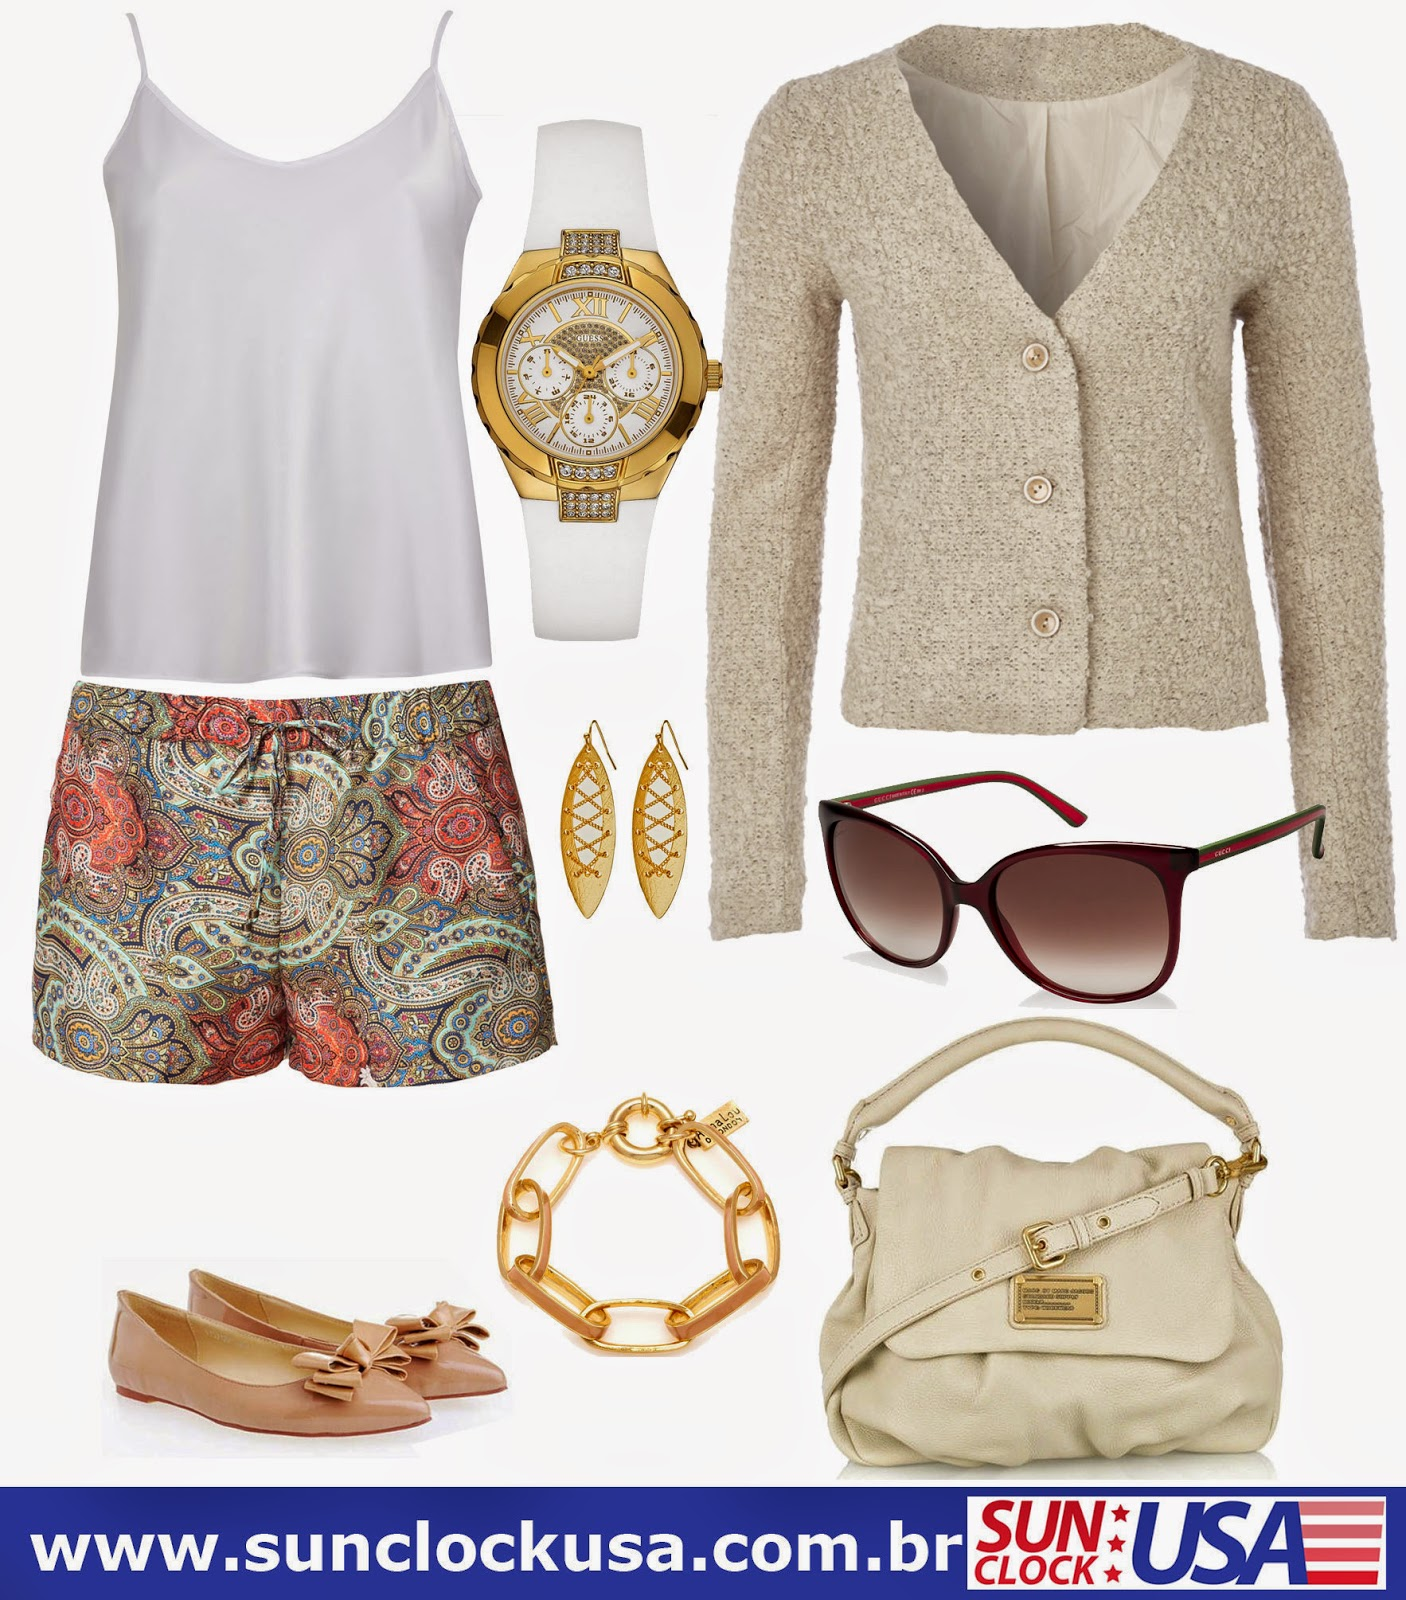 Relógios Guess e Óculos Gucci